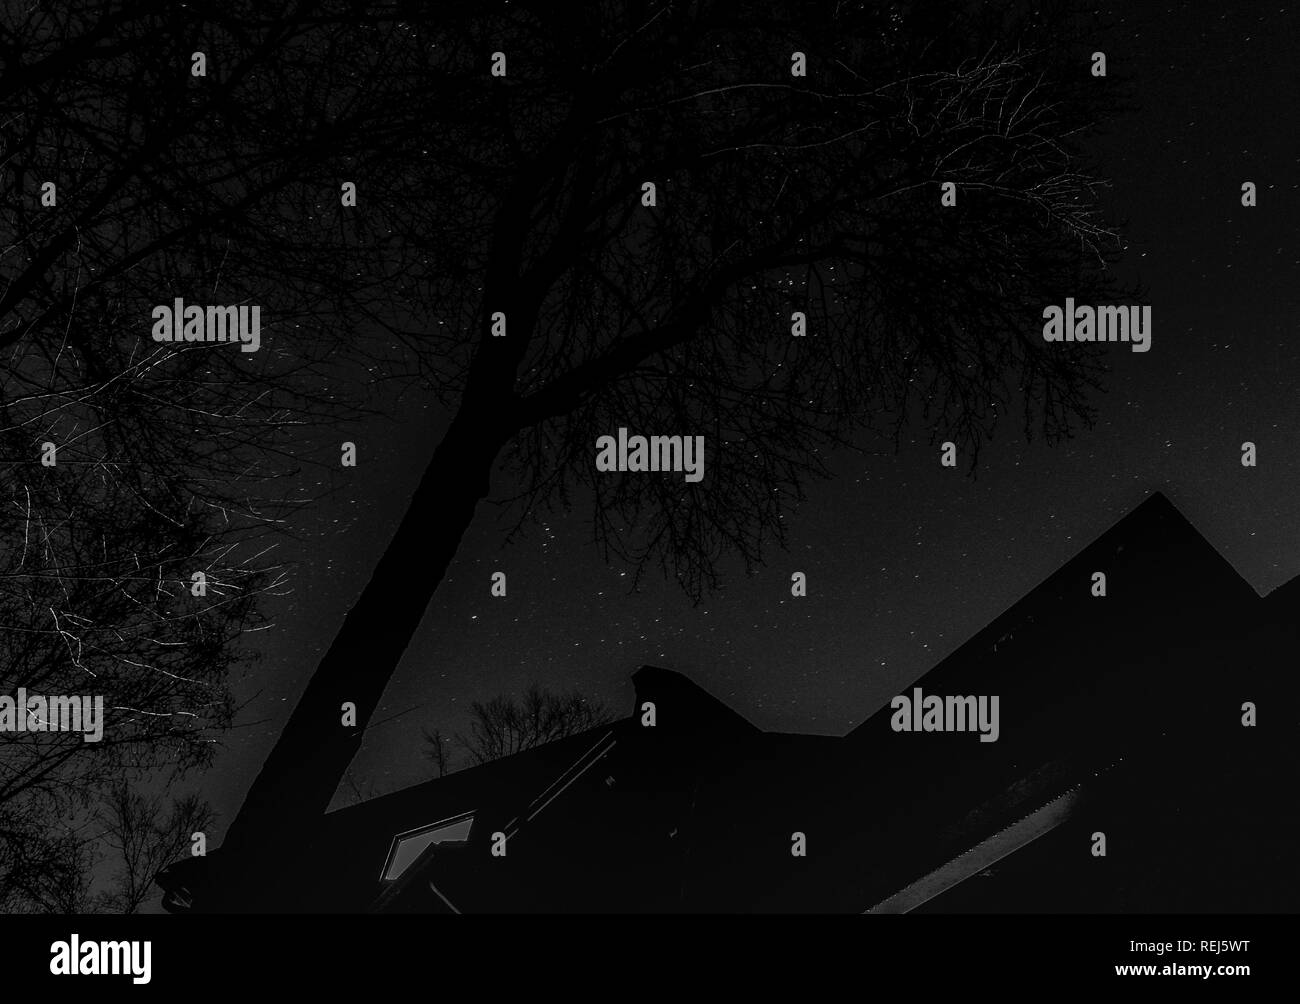 Starlight through the trees - Stock Image